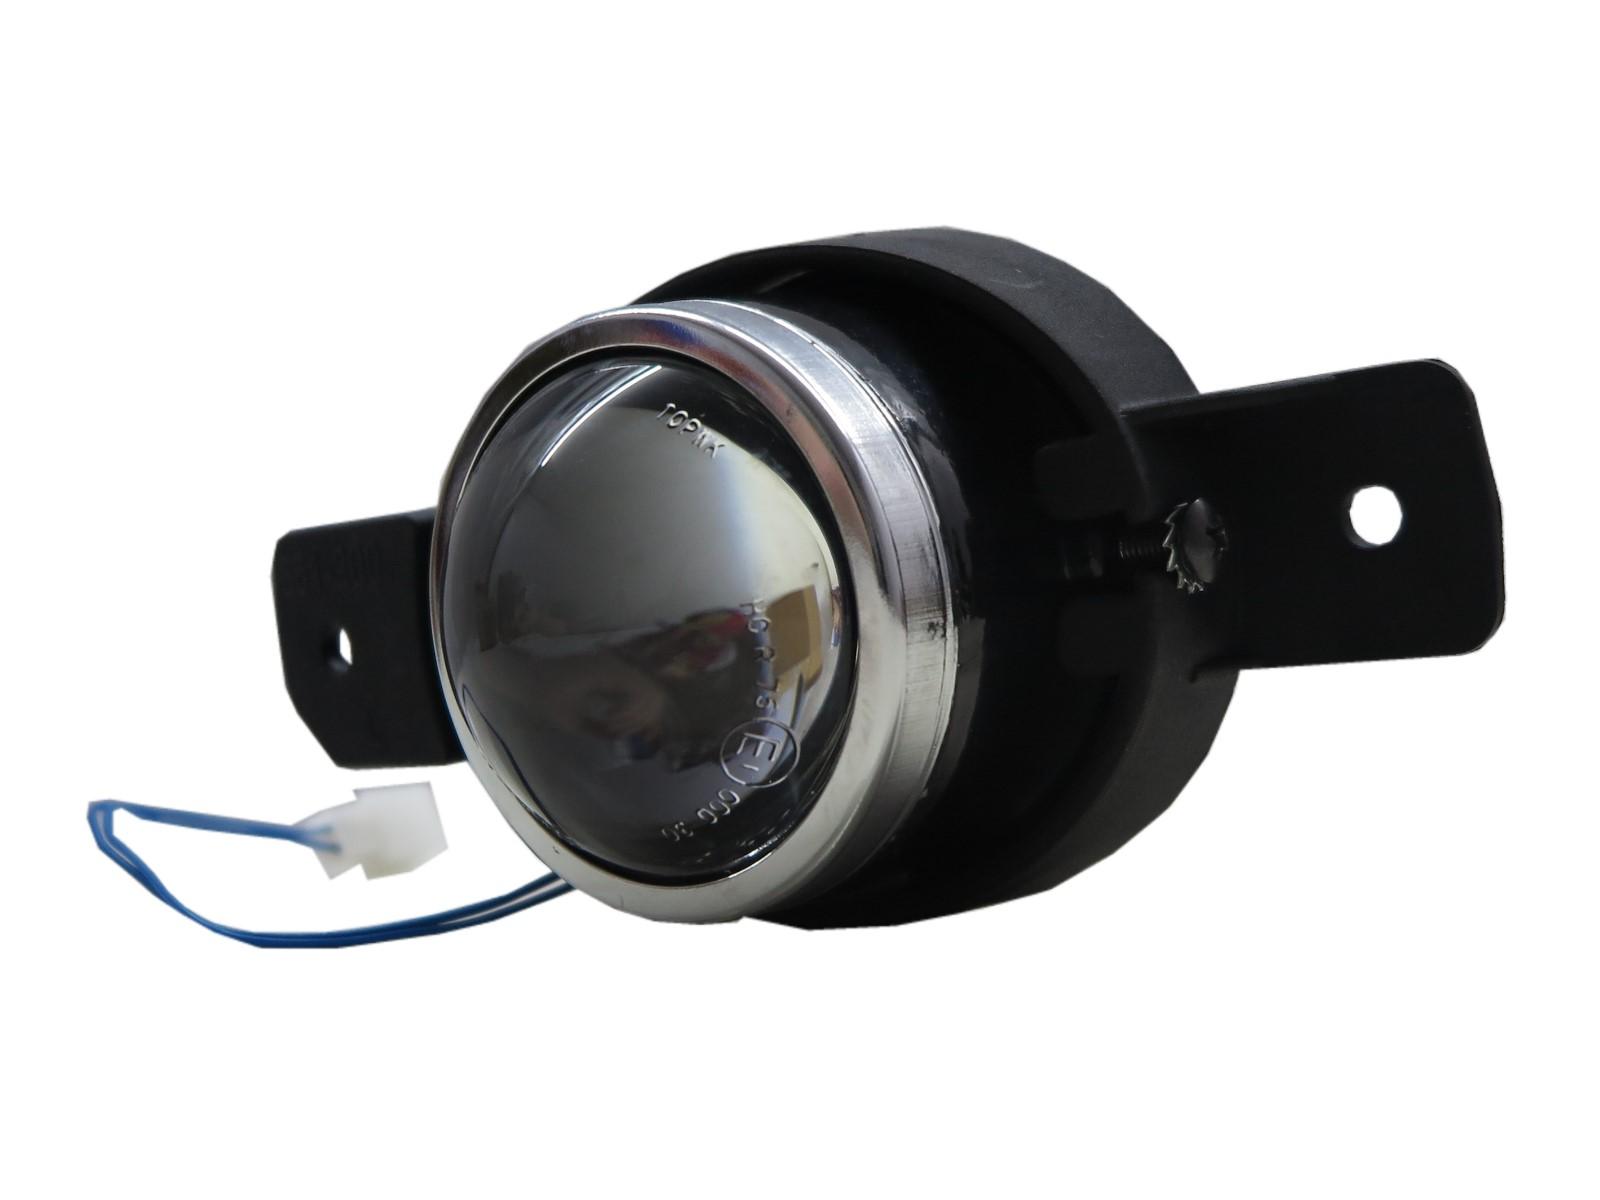 thumbnail 2 - Espace IV MK4 2003-2014 MPV 5D Projector Dual Beam Fog Light Black for RENAULT